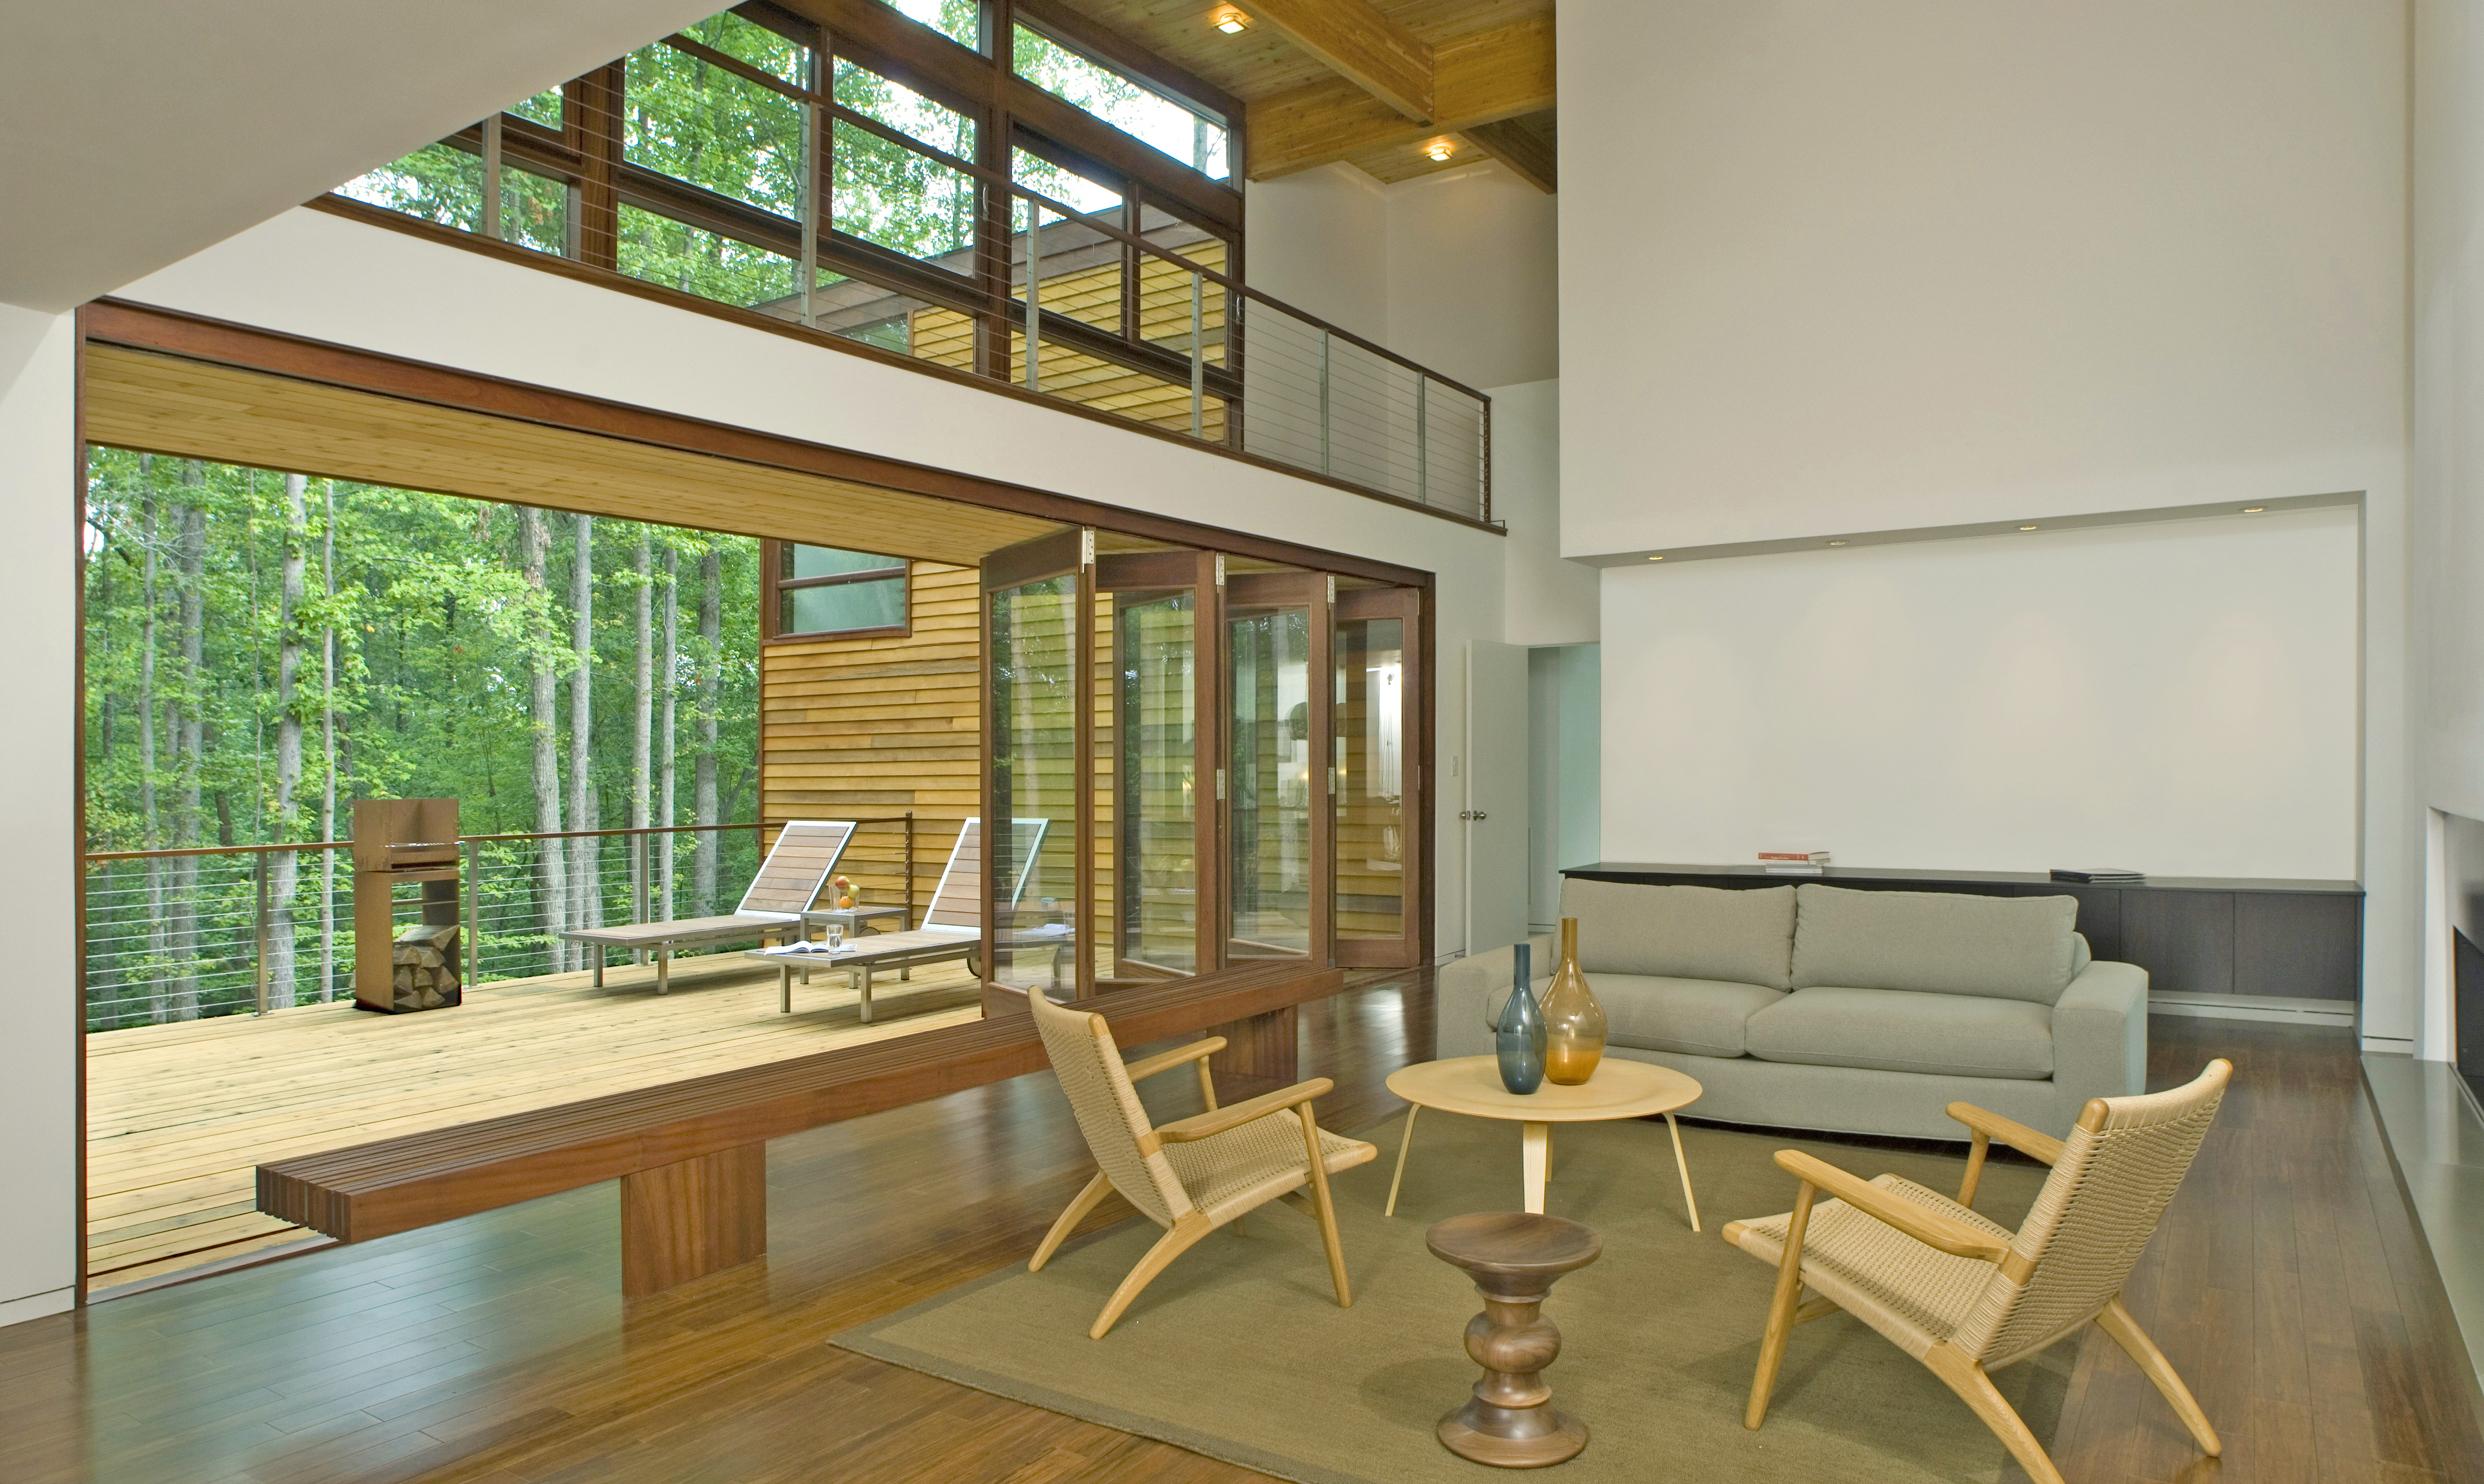 turkel_modern_design_prefab_home_redhill_hillsborough_great_room.jpg